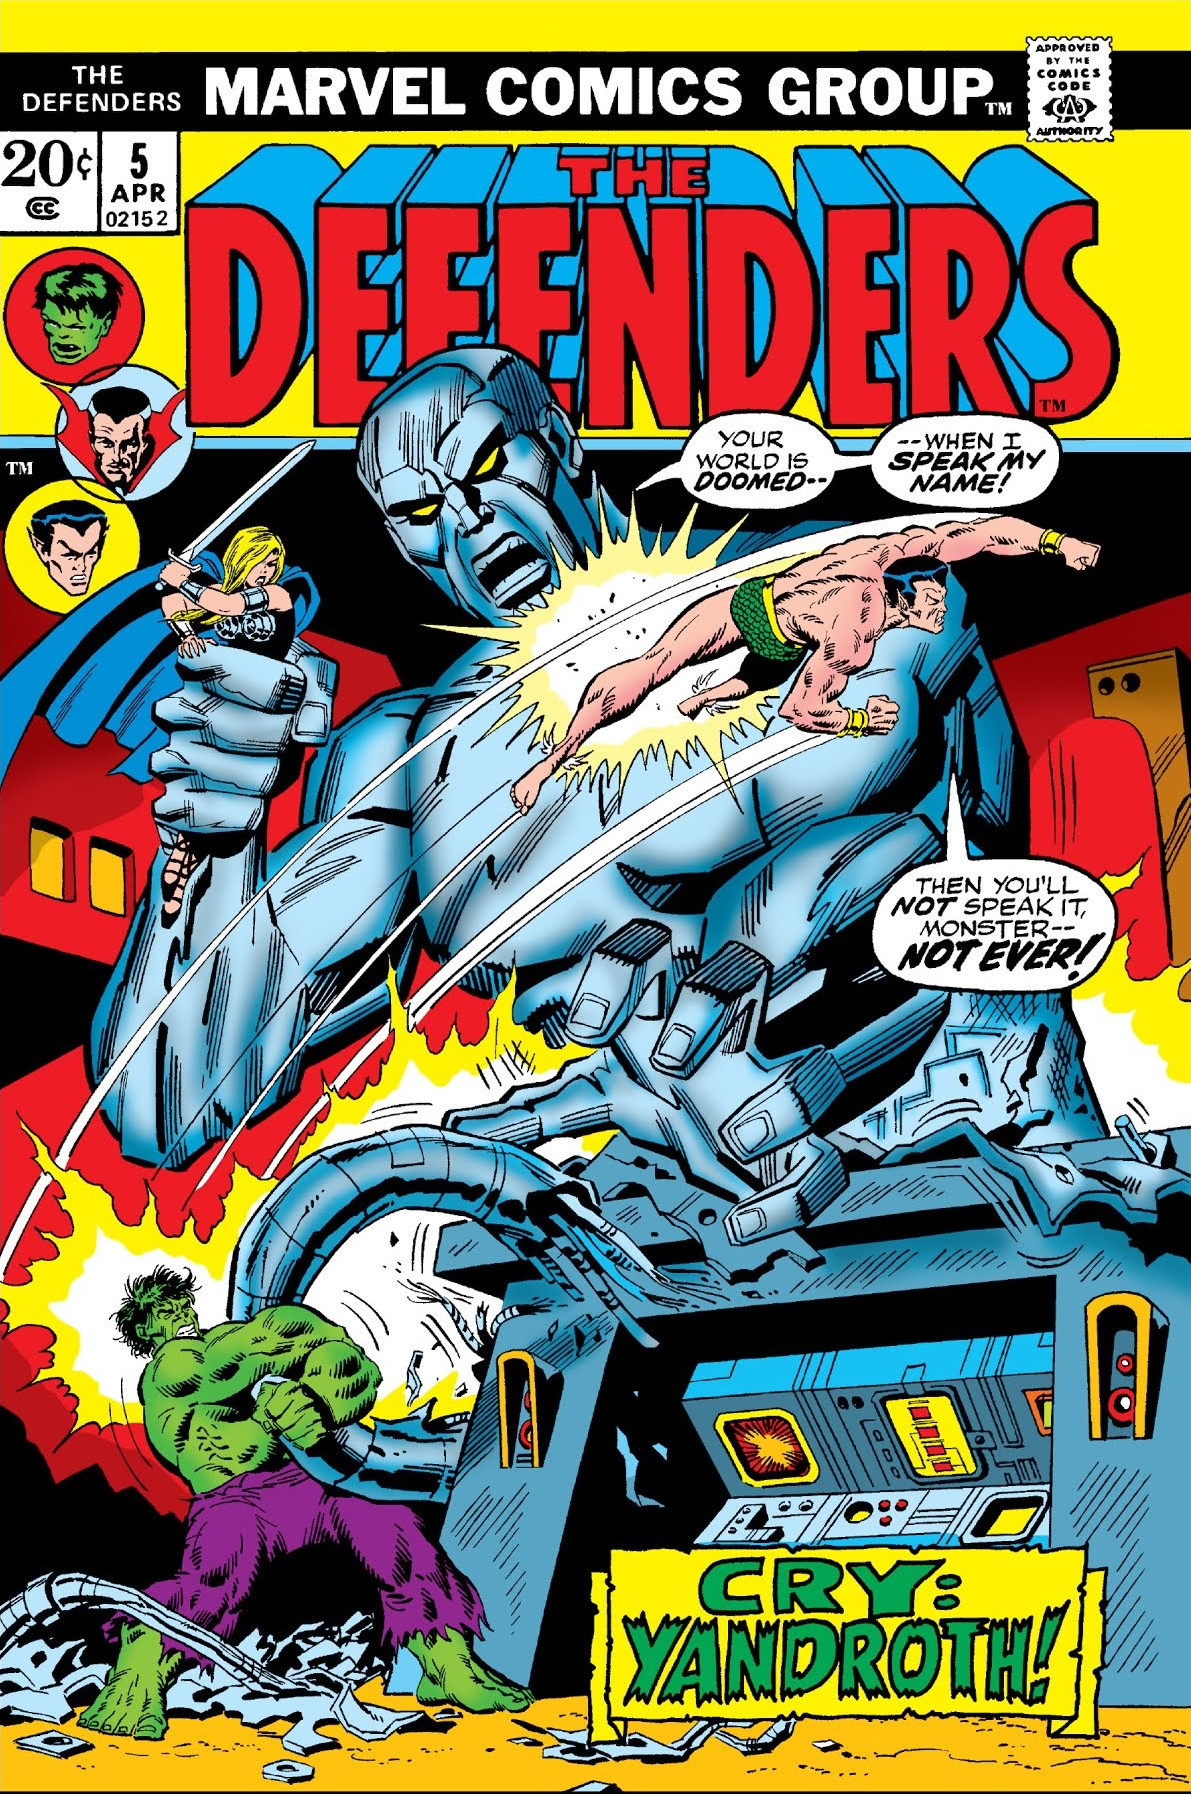 The Defenders #83. Marvel, 1980